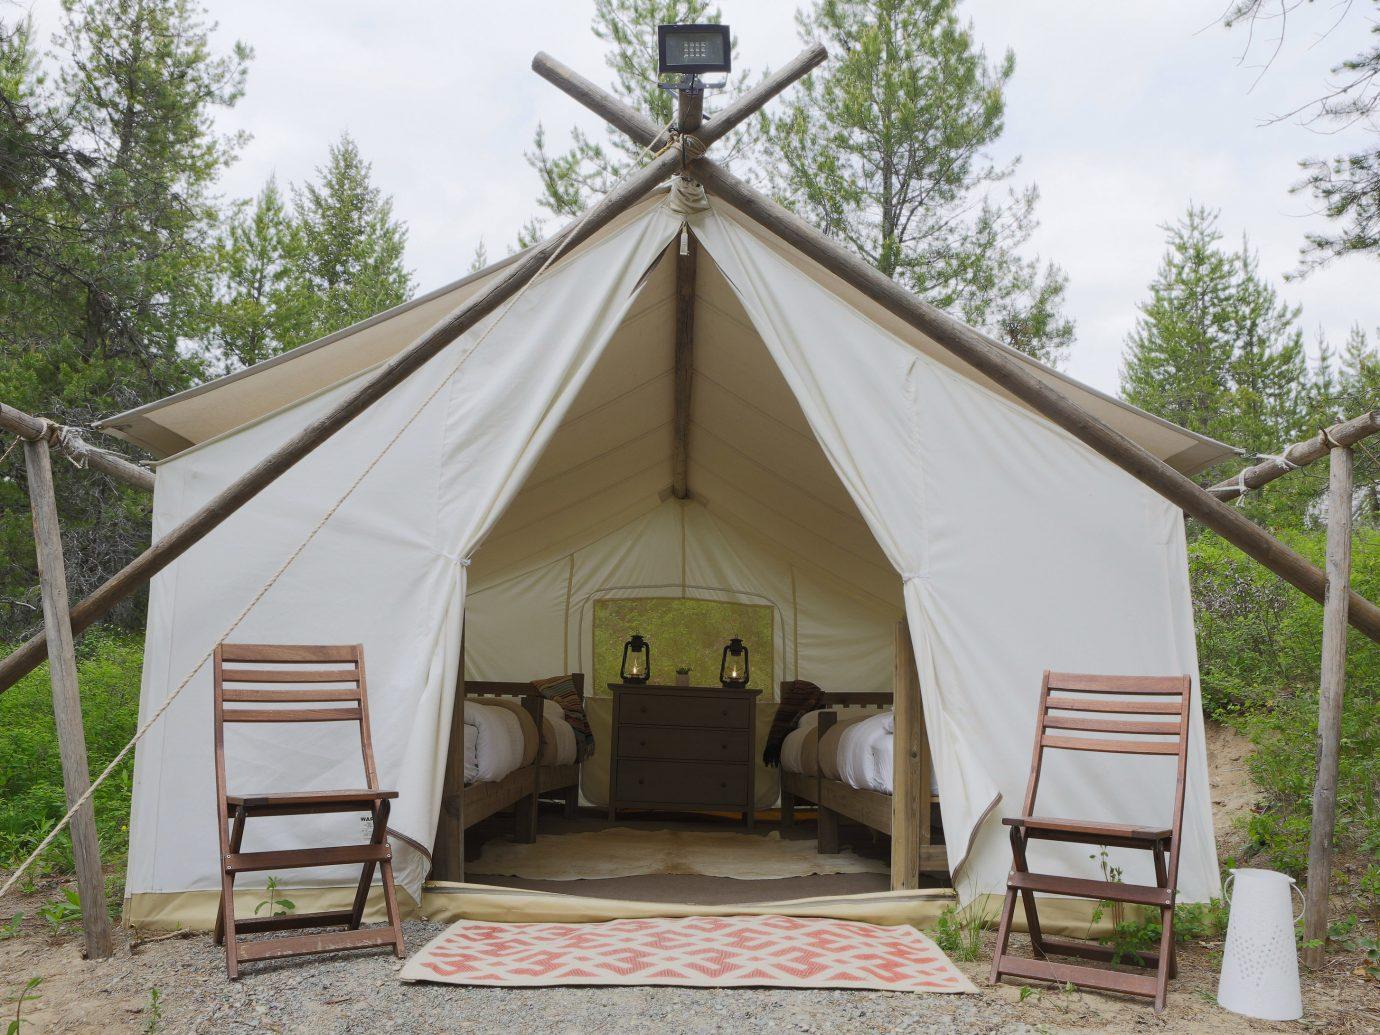 Glamping Outdoors + Adventure Weekend Getaways tree sky outdoor tent outdoor object camp